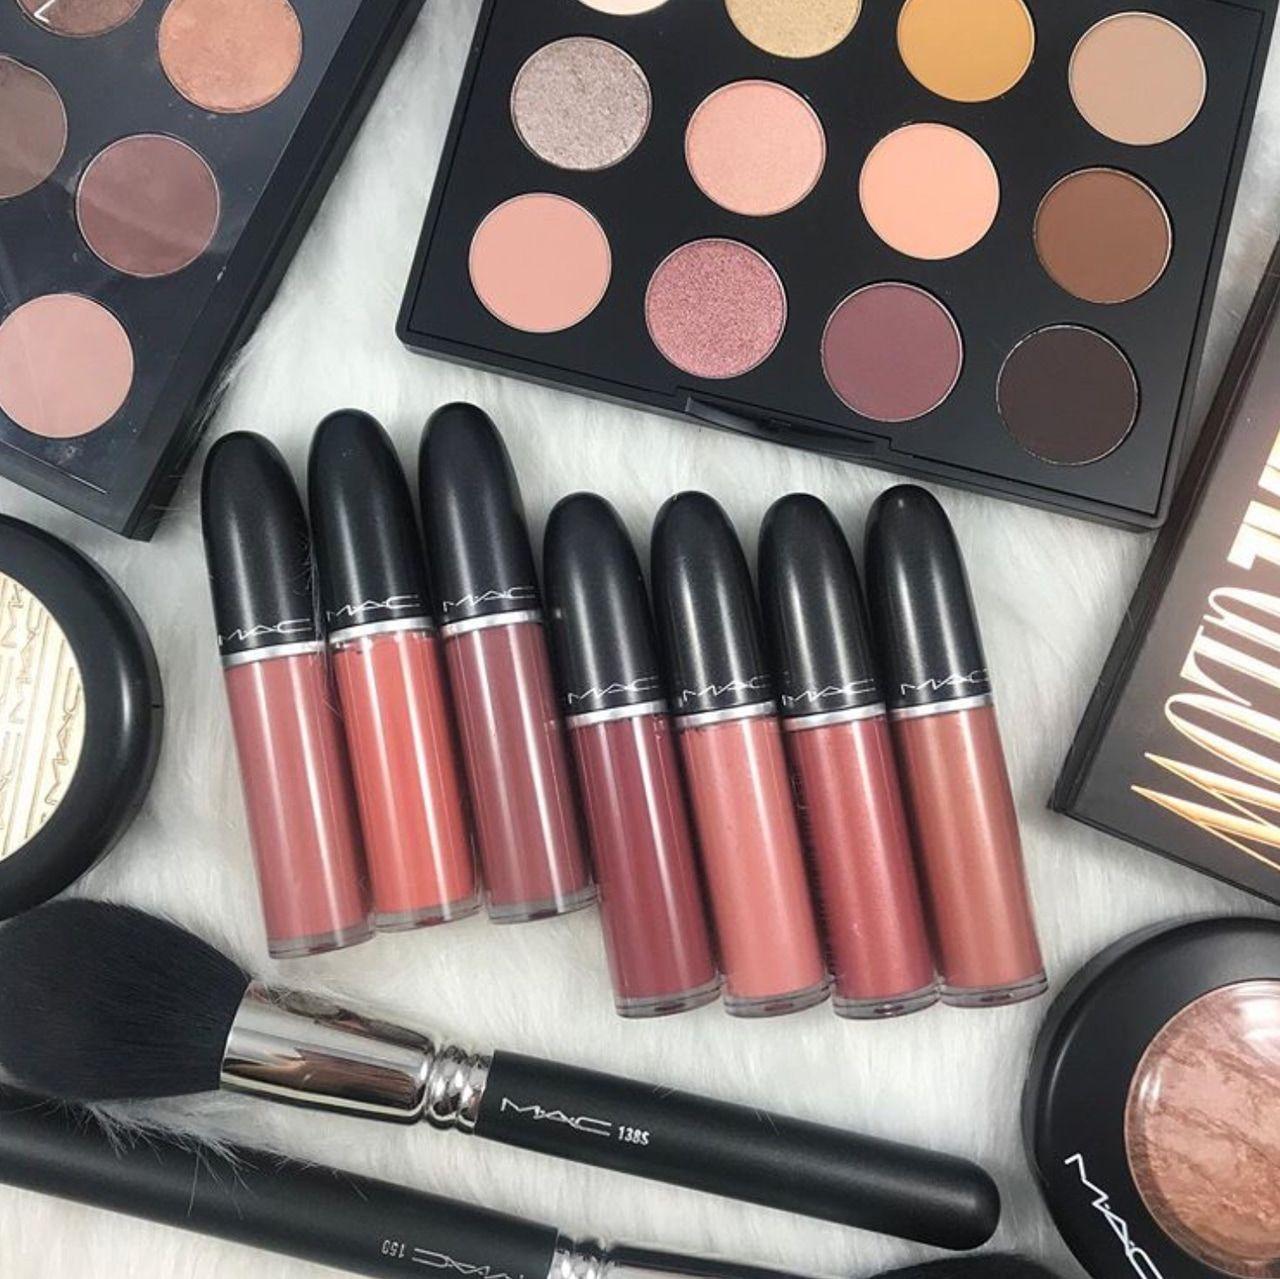 Pin by ᏚᎻᎾᏚᎻᎾ ᏚᎻᏆNᎬ on ᏴᎬᎪᏌᎢY Lipstick, Makeup, Mac makeup